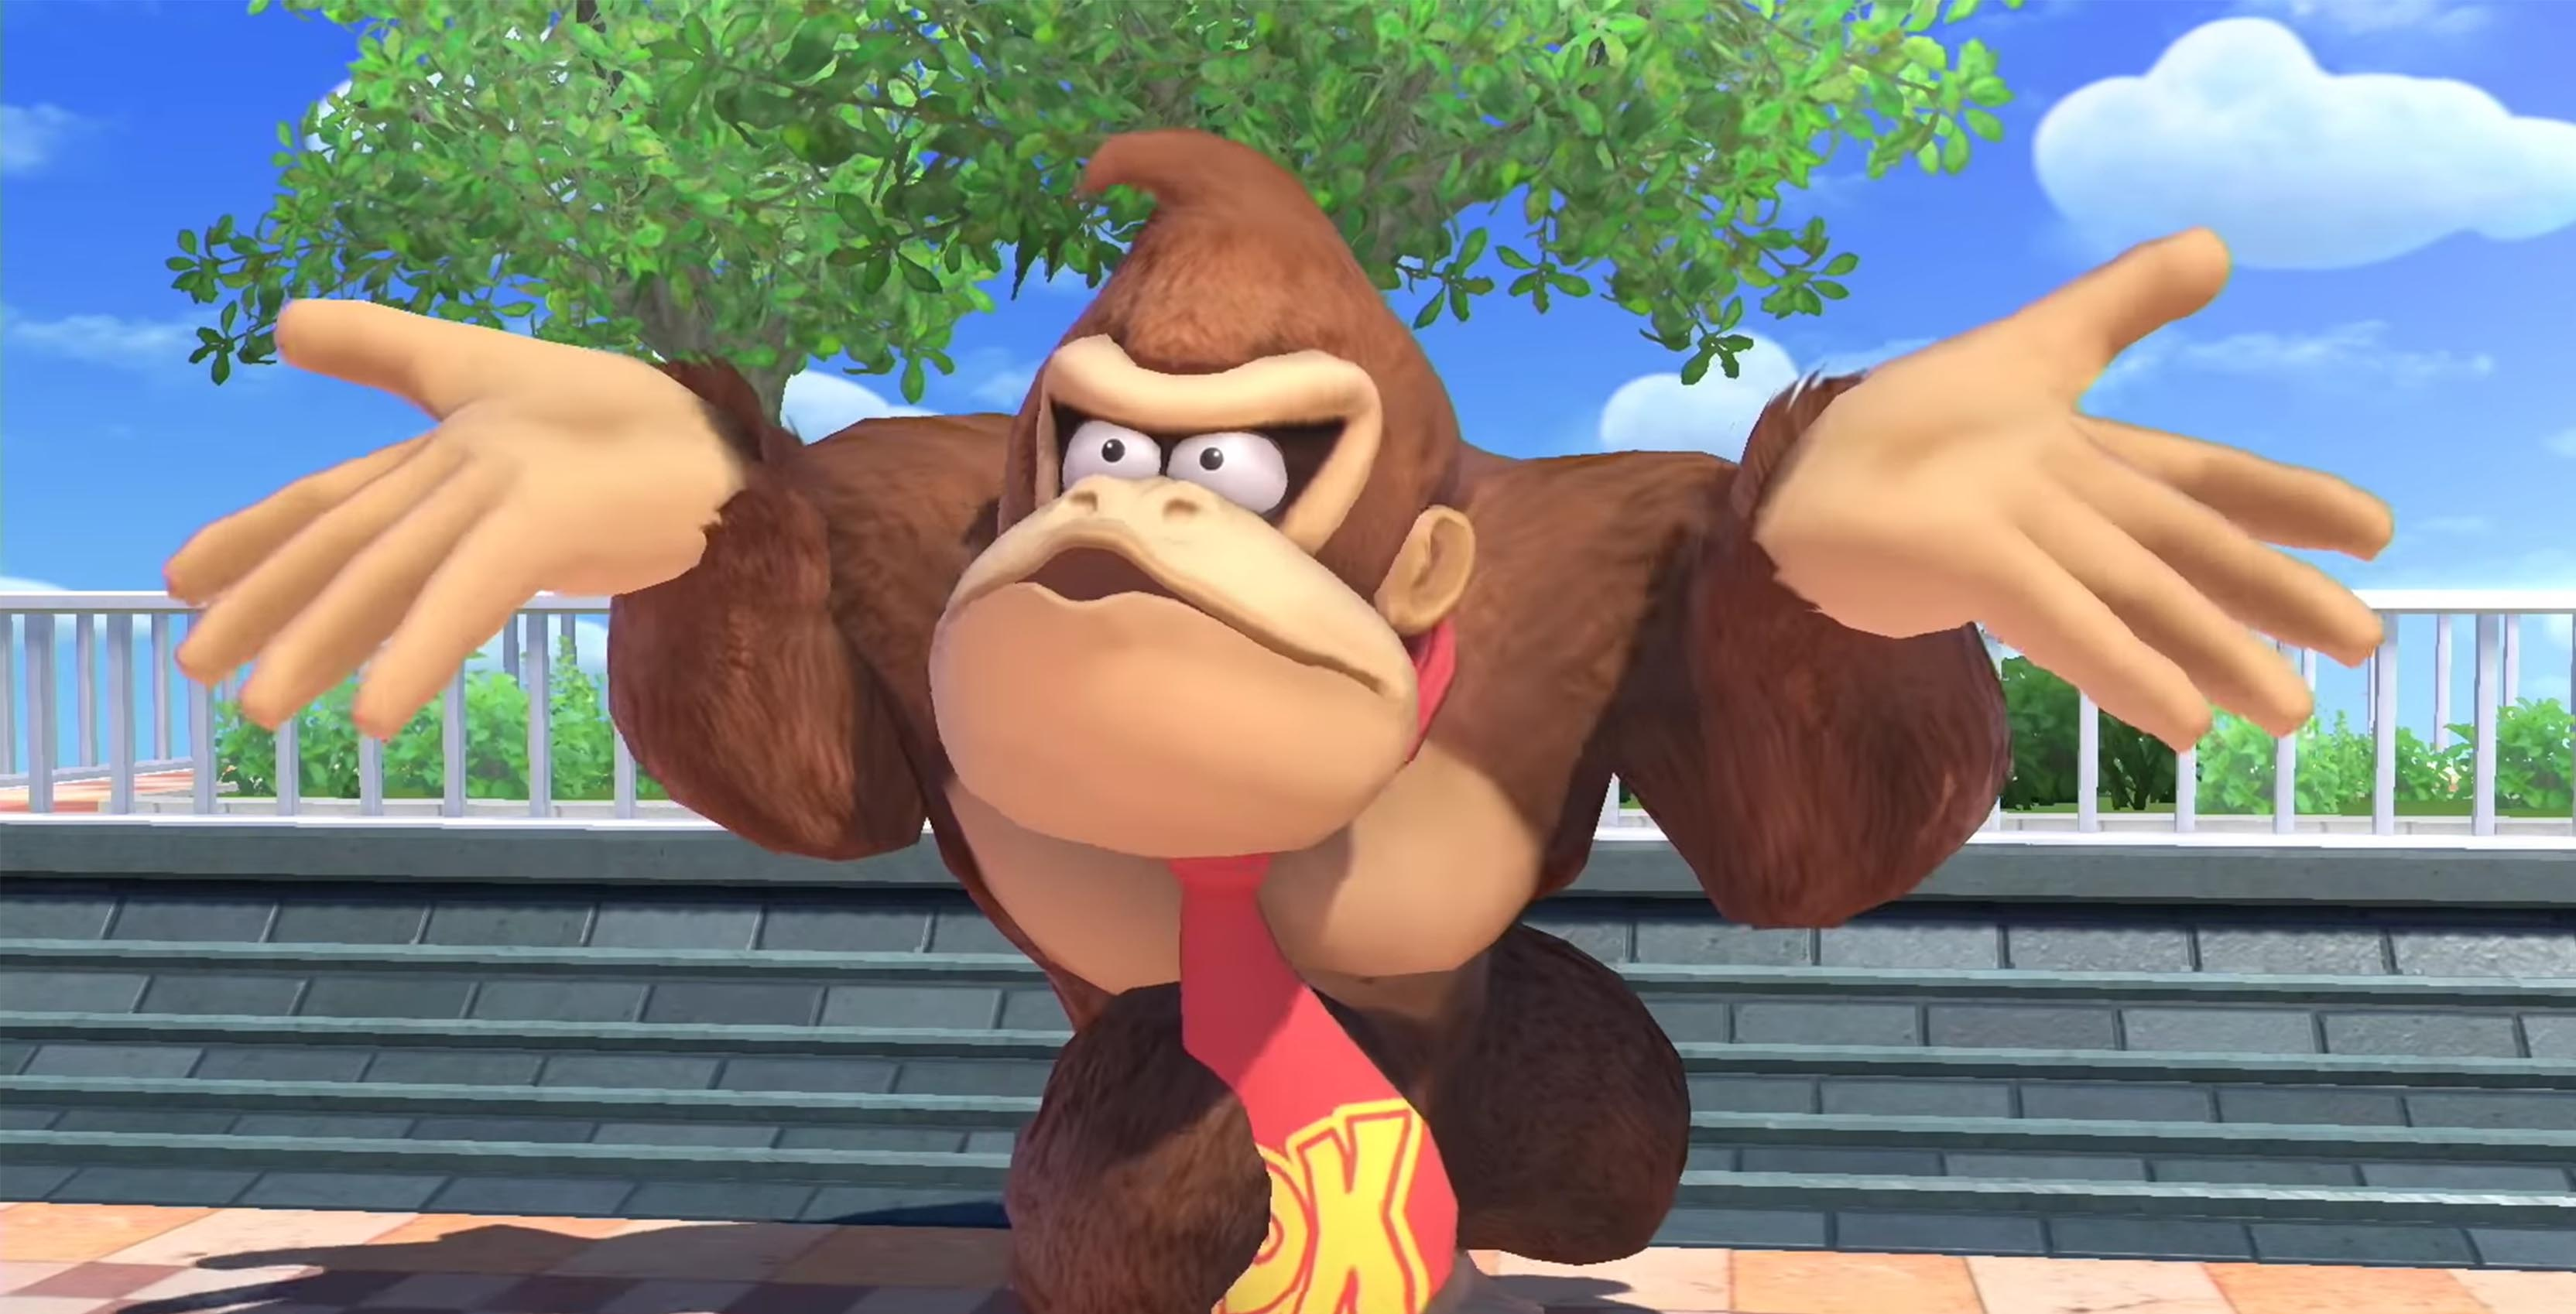 Donkey Kong confused Super Smash Bros.